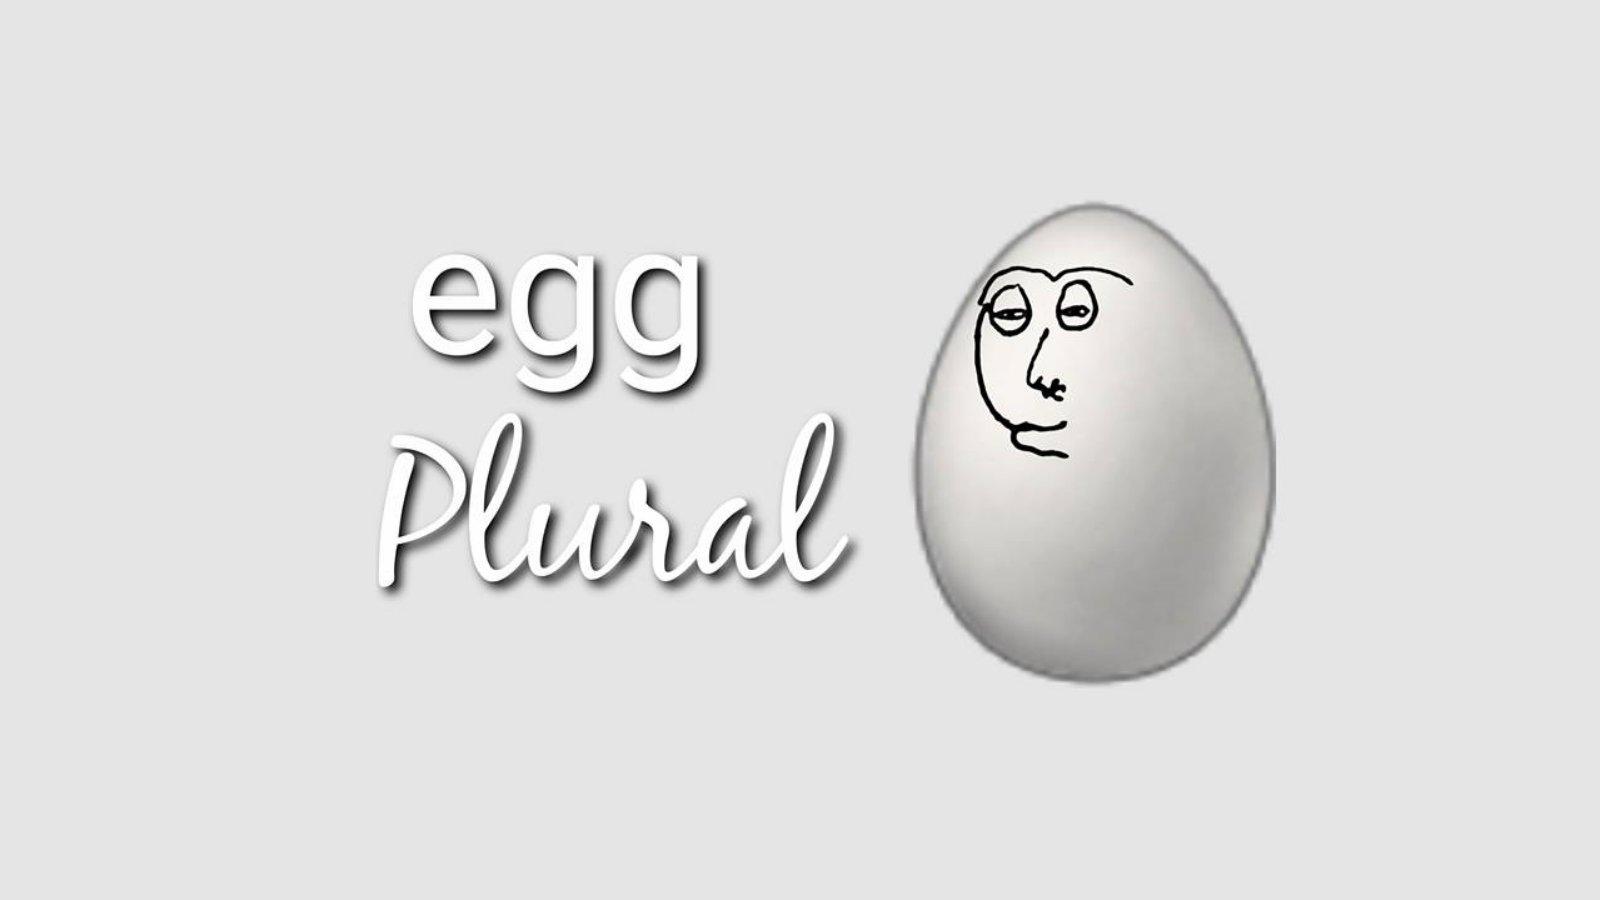 Egg Plural | Know Your Meme